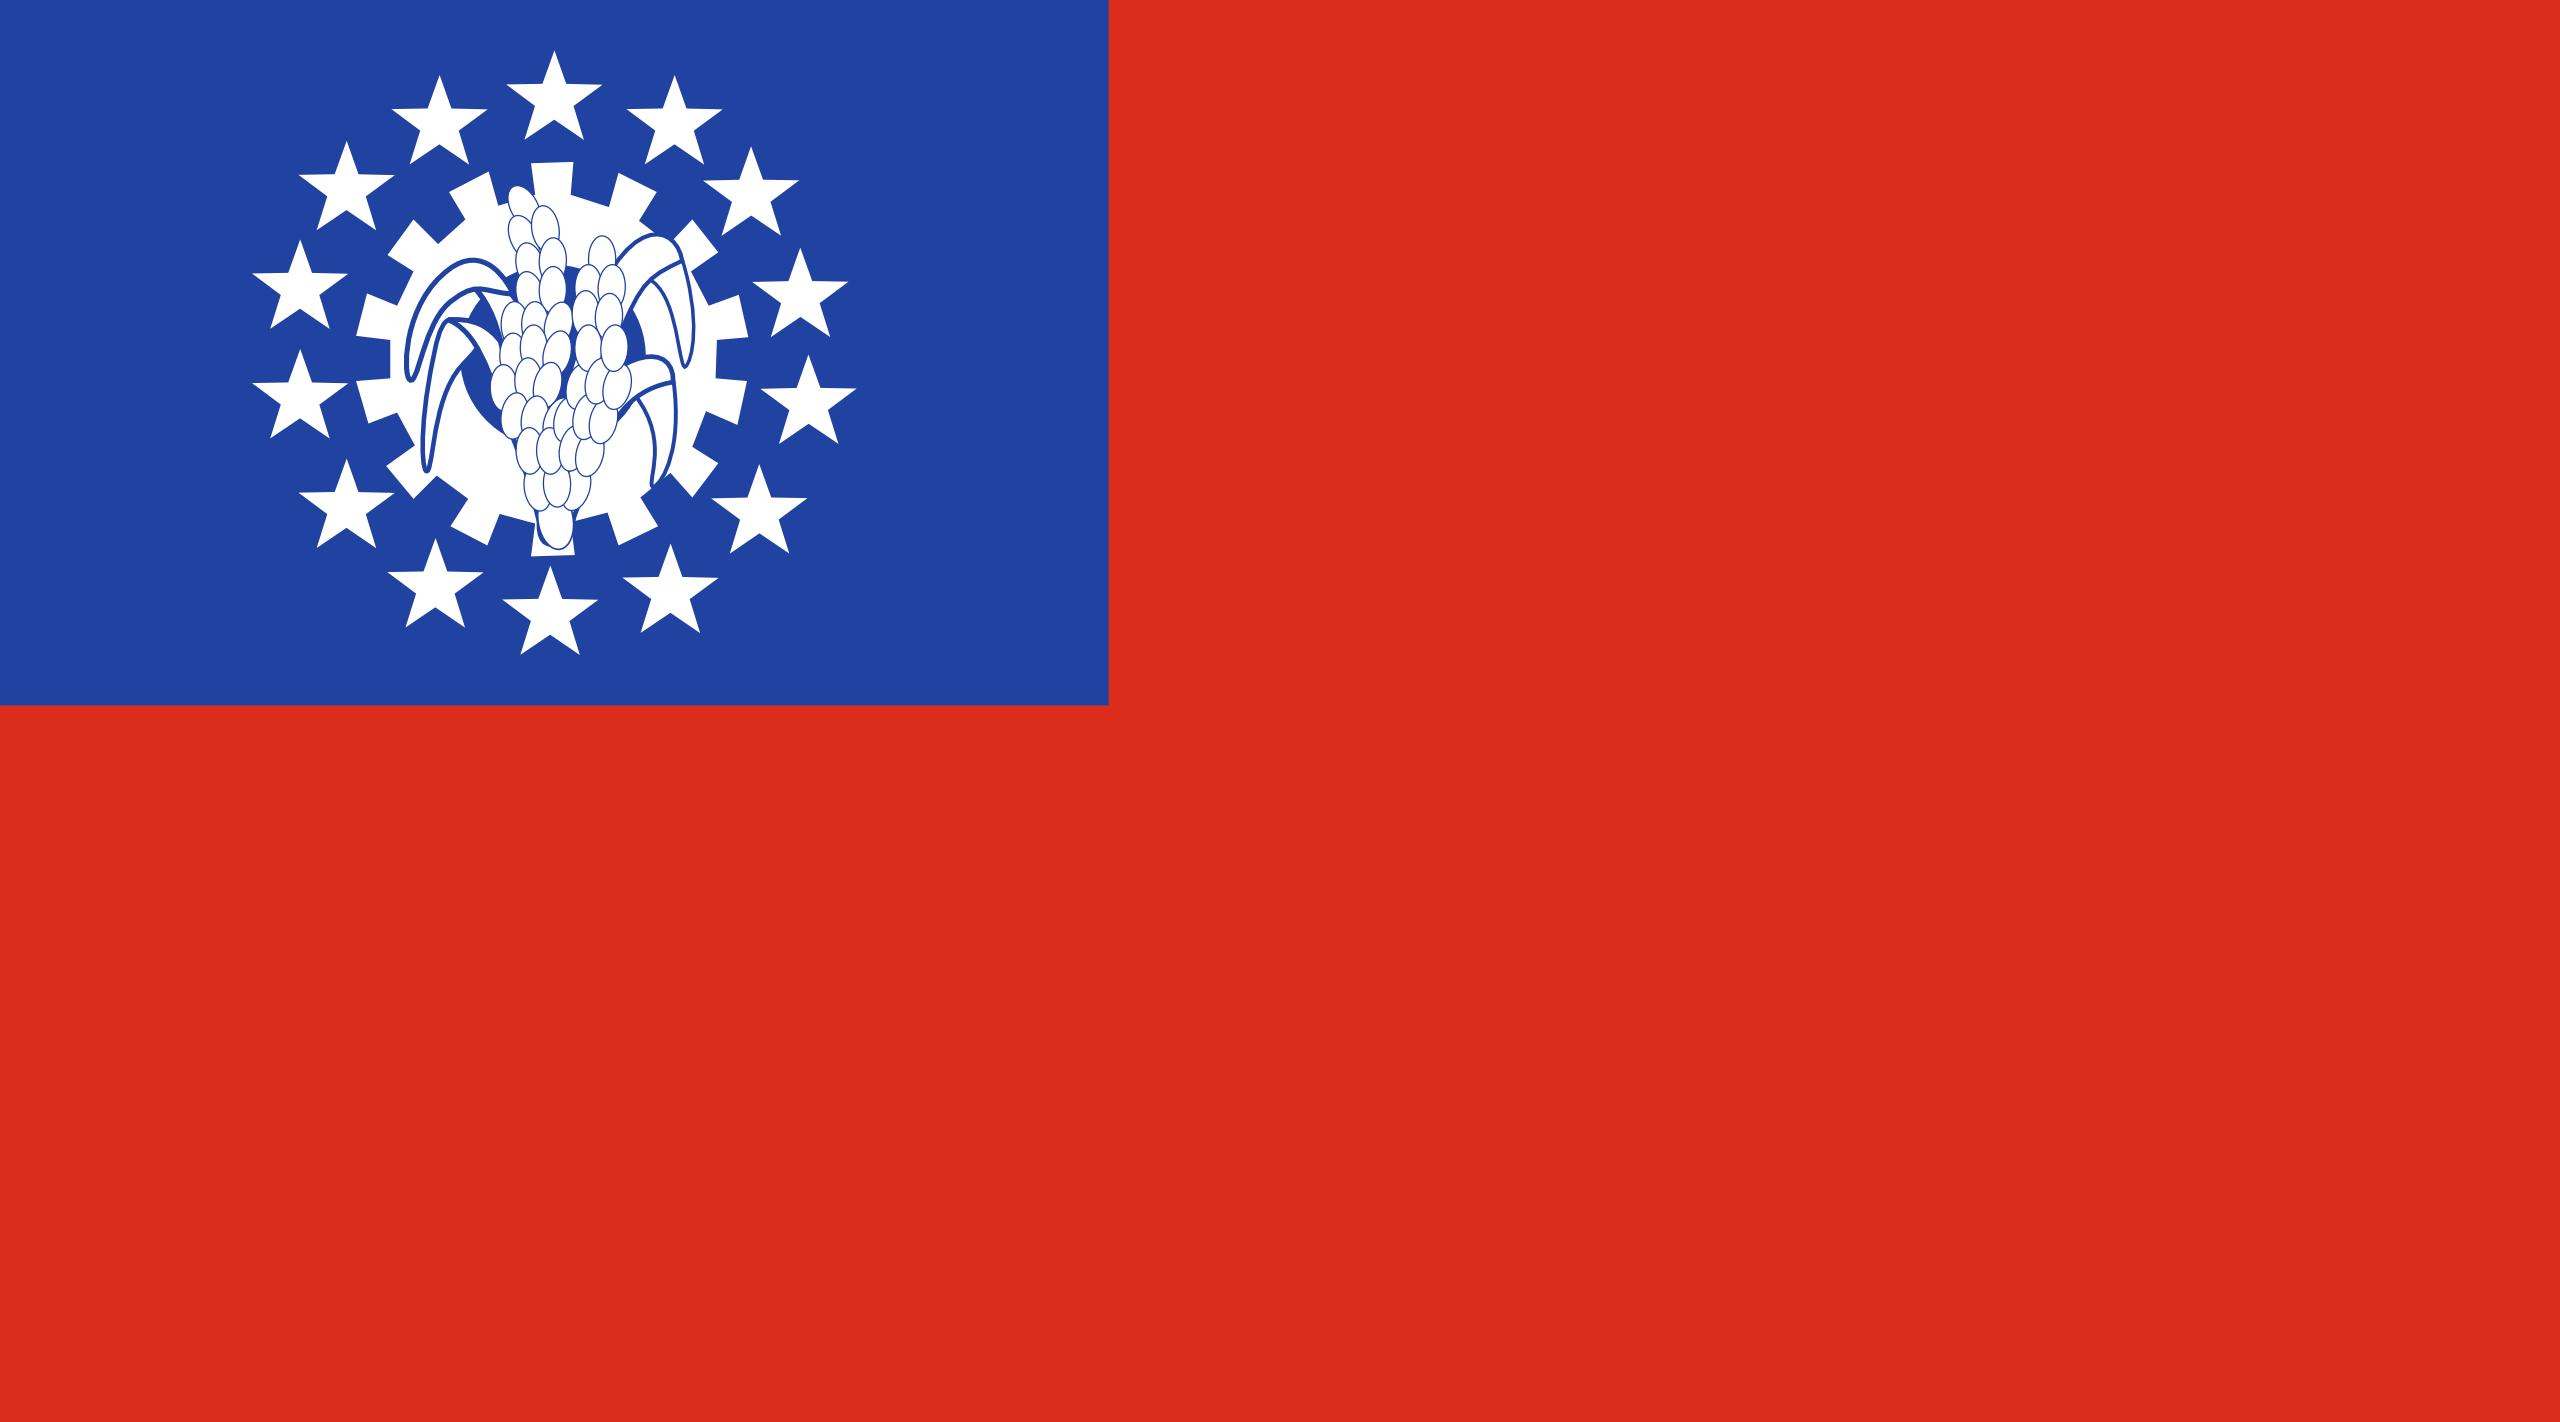 Myanmar Tourist Visa (Myanmar flag)